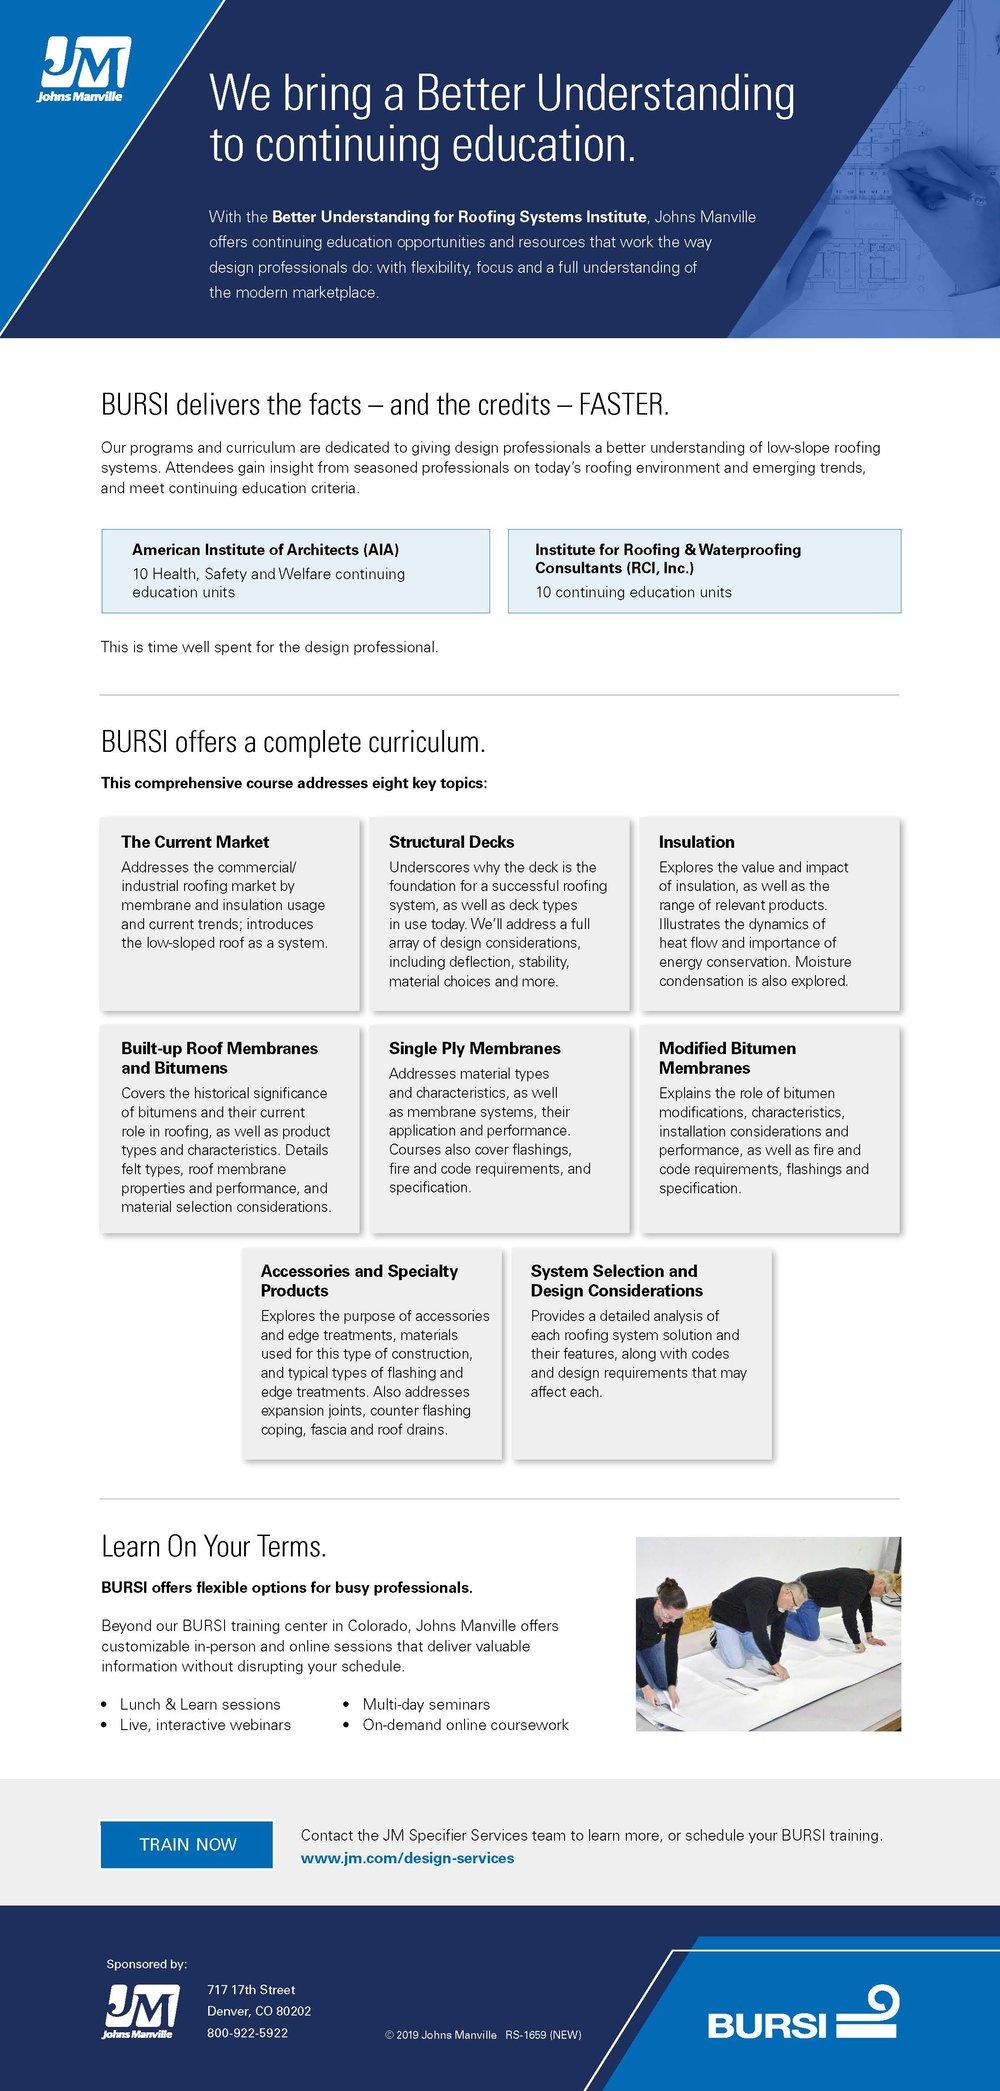 BURSI - Better Understanding of Roofing Systems Institute